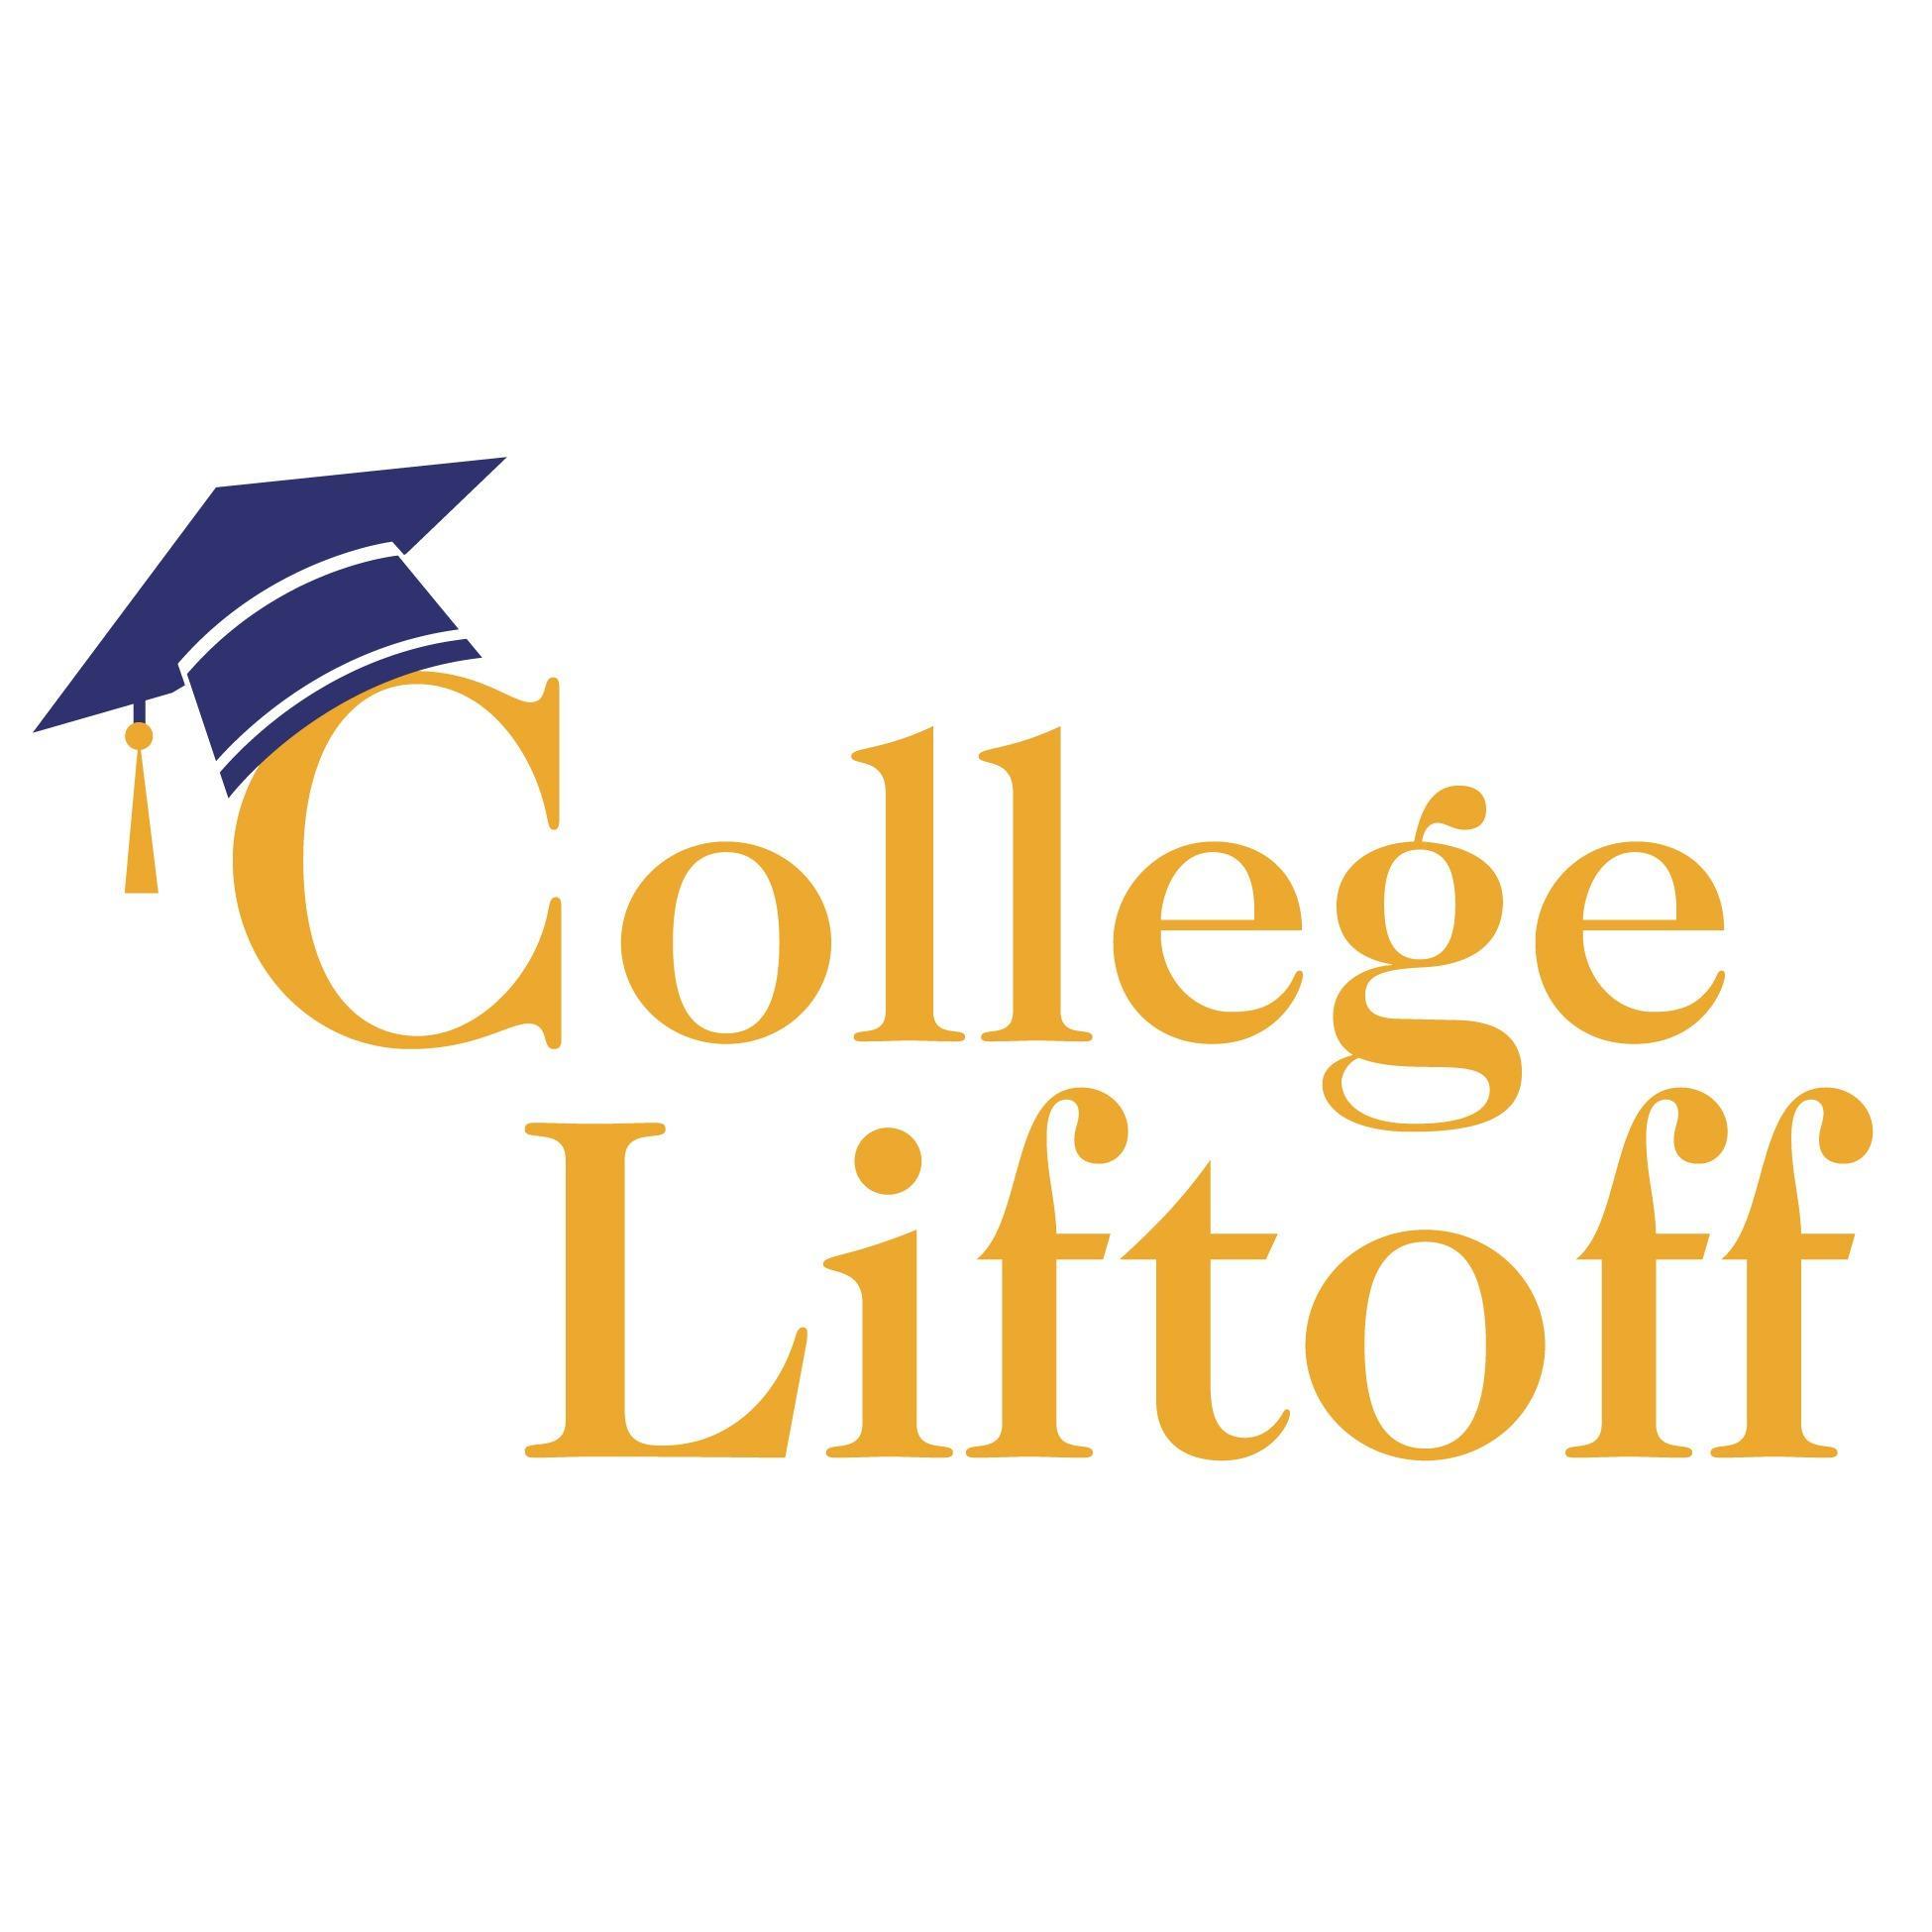 College Liftoff